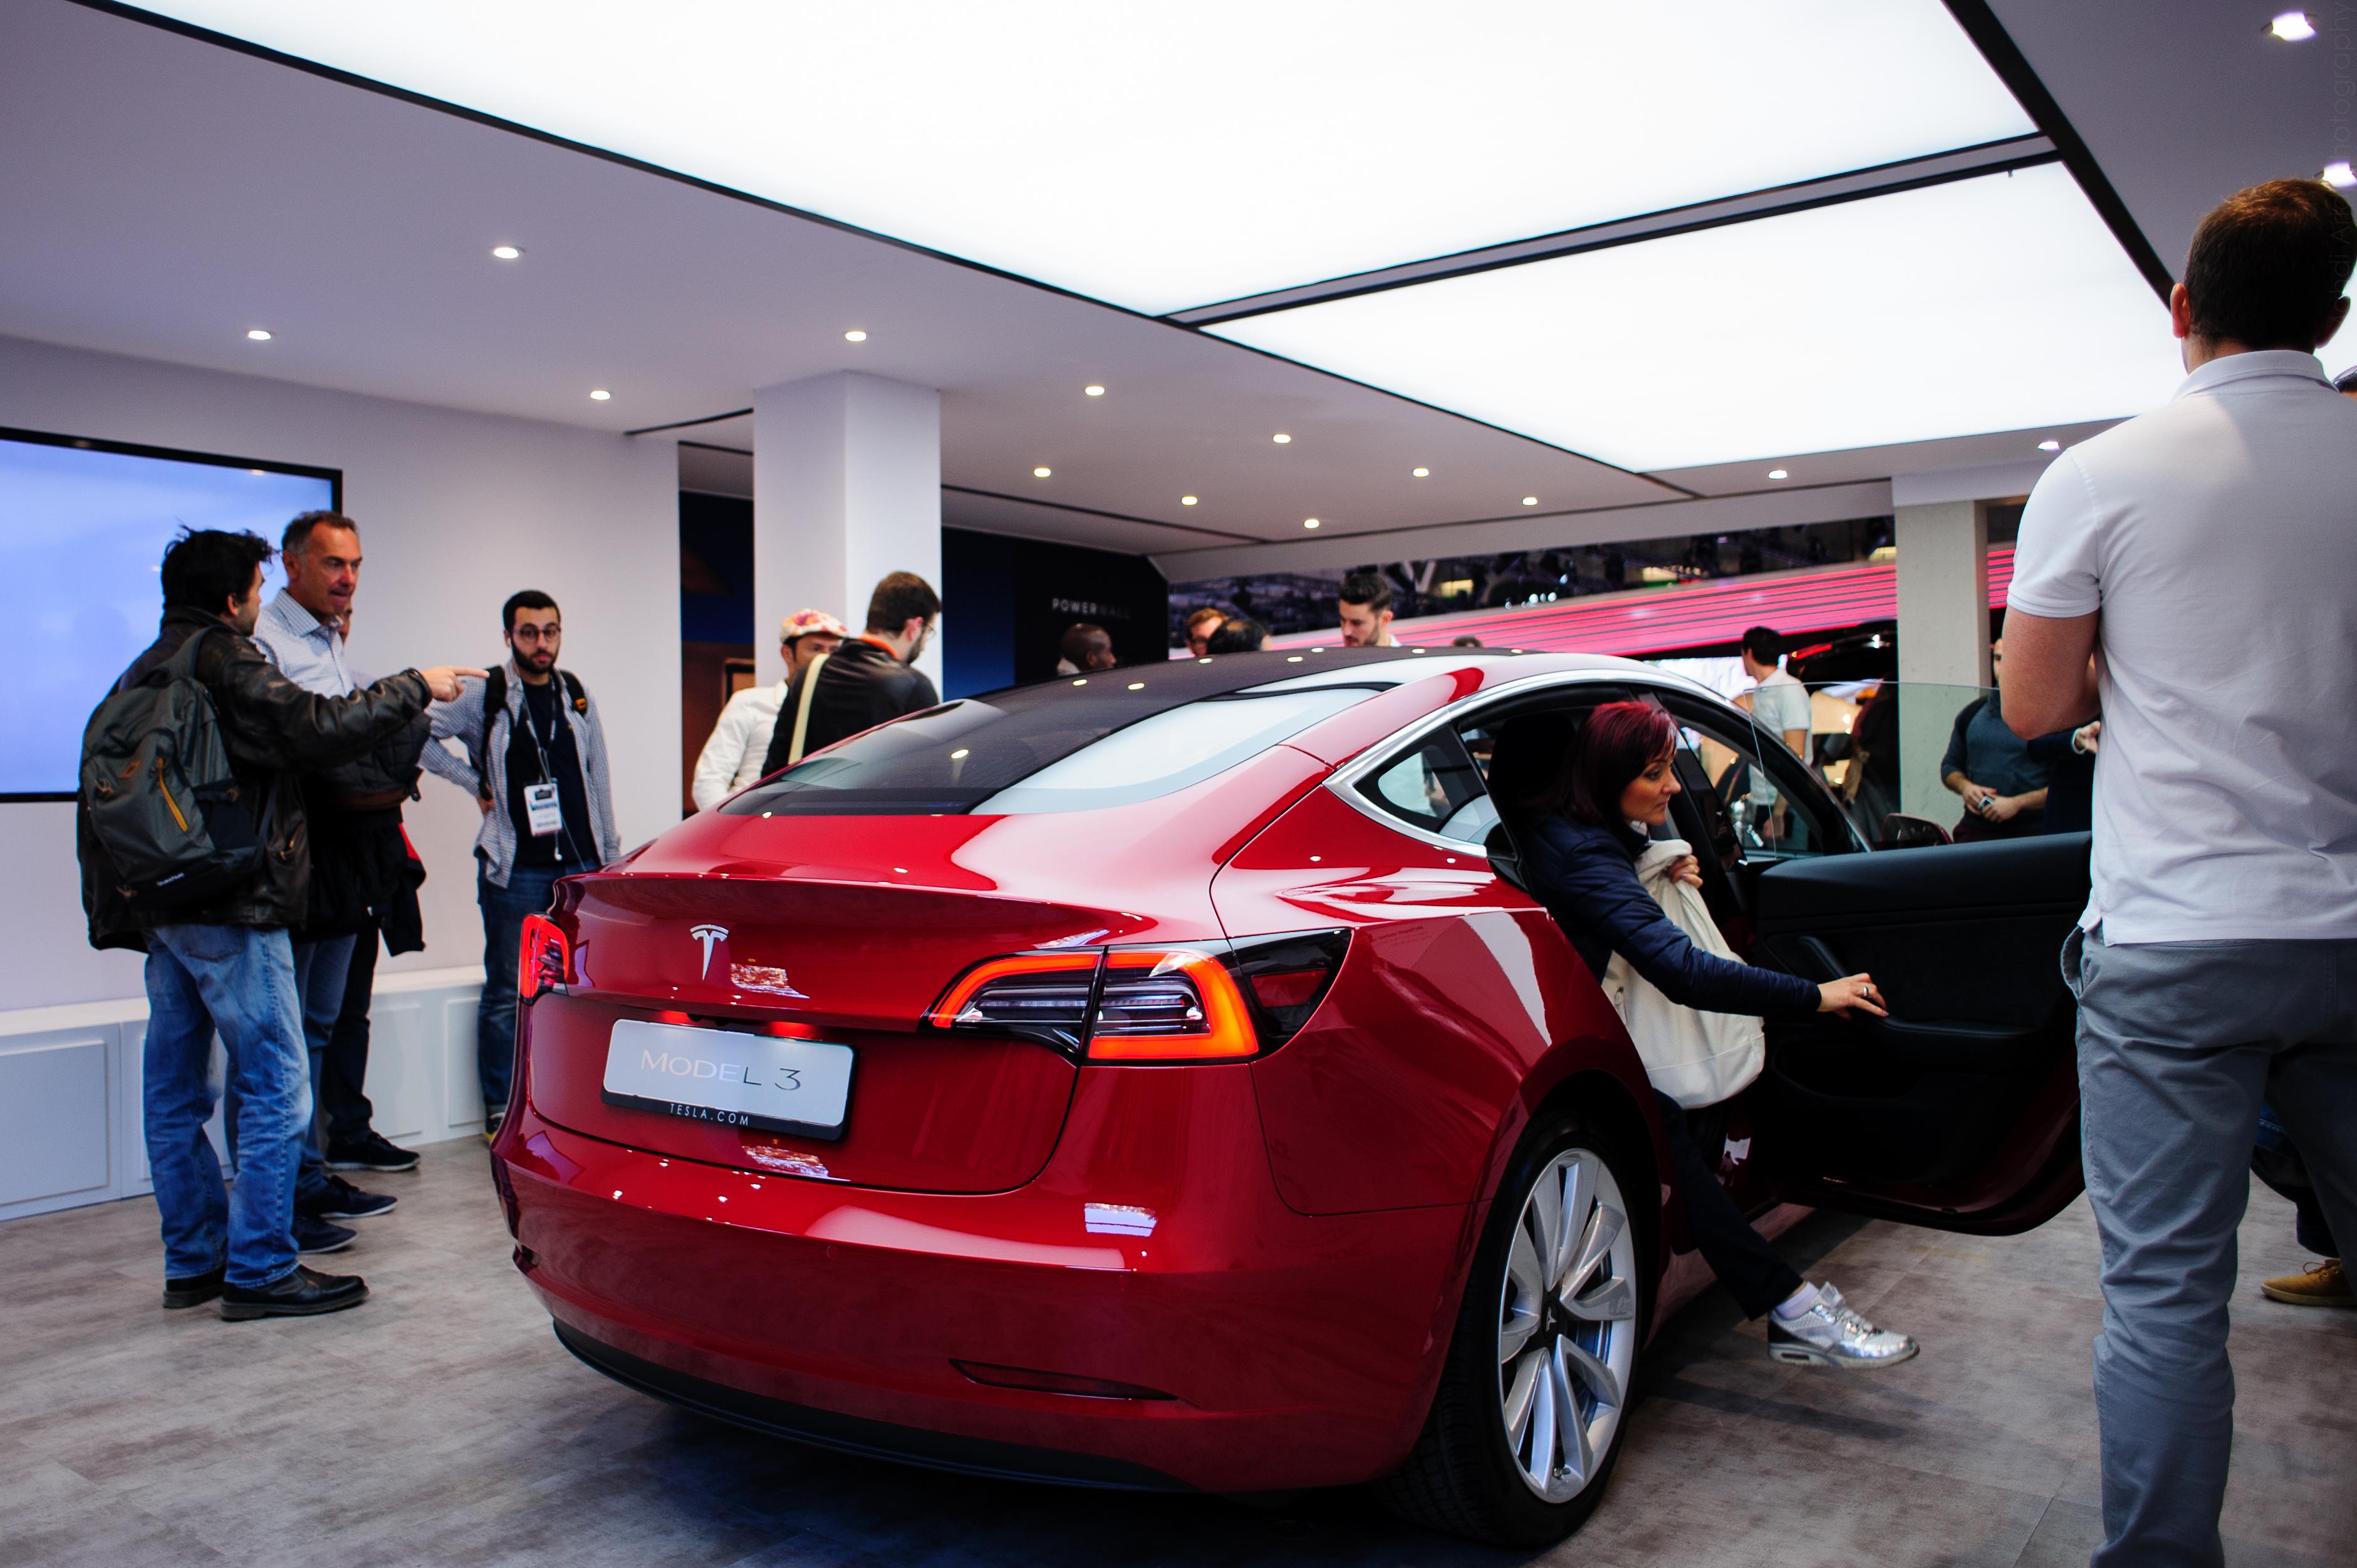 Tesla model 3 at the Paris Motor Show - Mondial Auto 2018